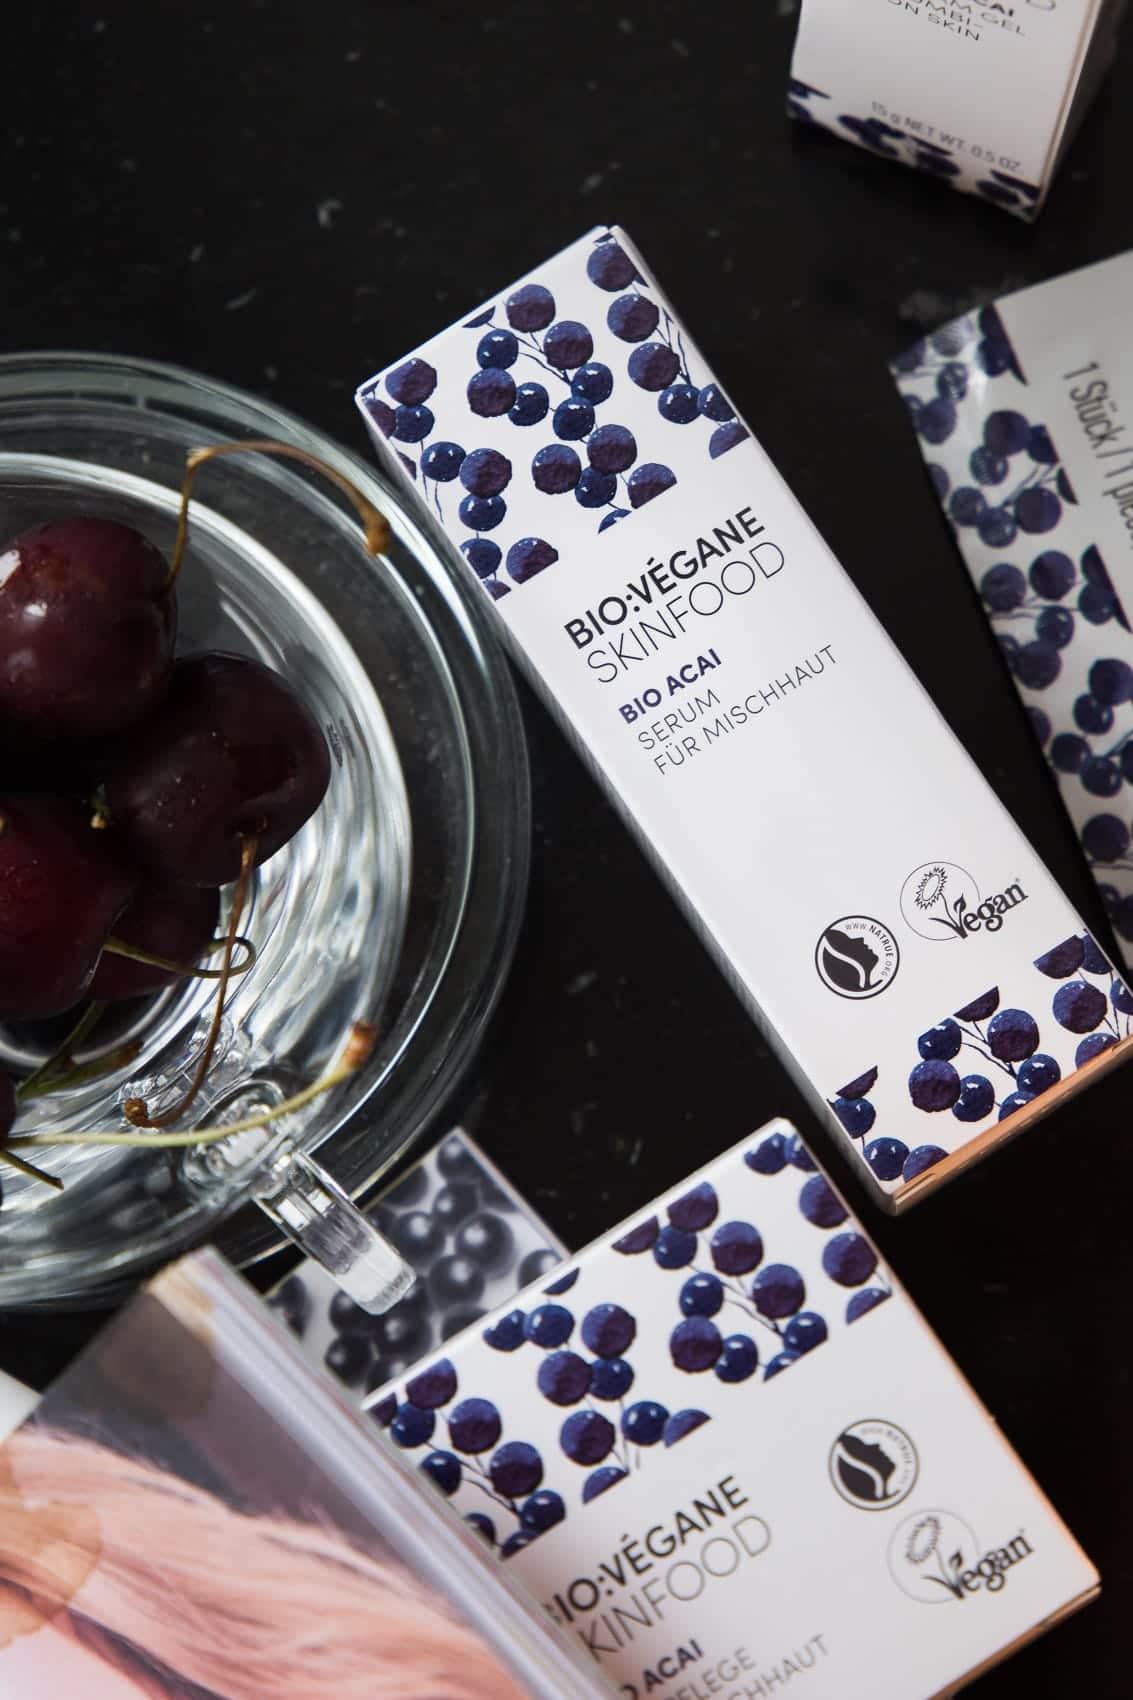 Skincare + Superfood = Skinfood: Das steckt hinter Végane Skinfood!